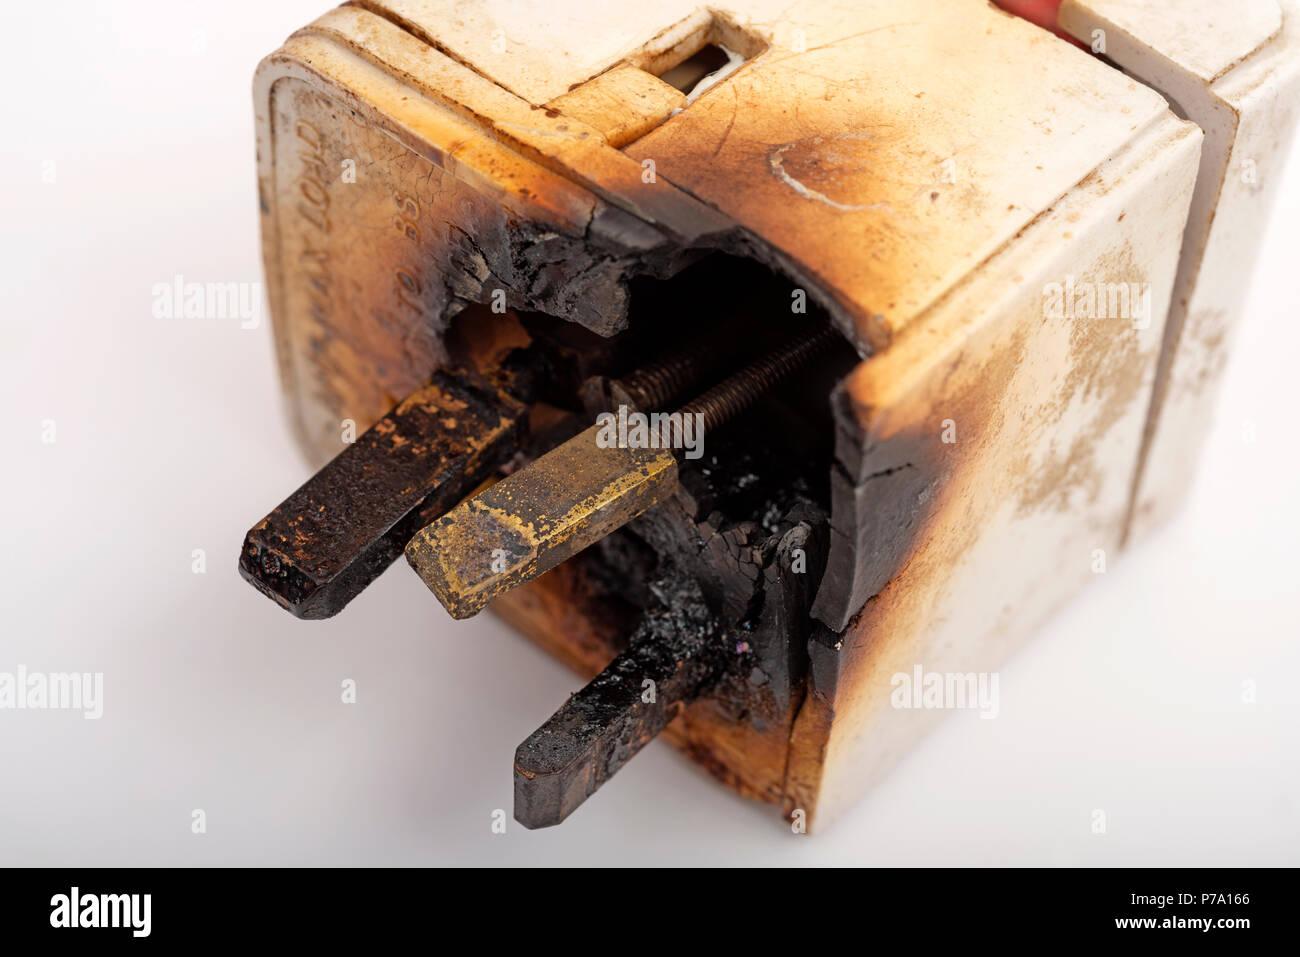 Fired damaged 3-pin electrical plug - Stock Image